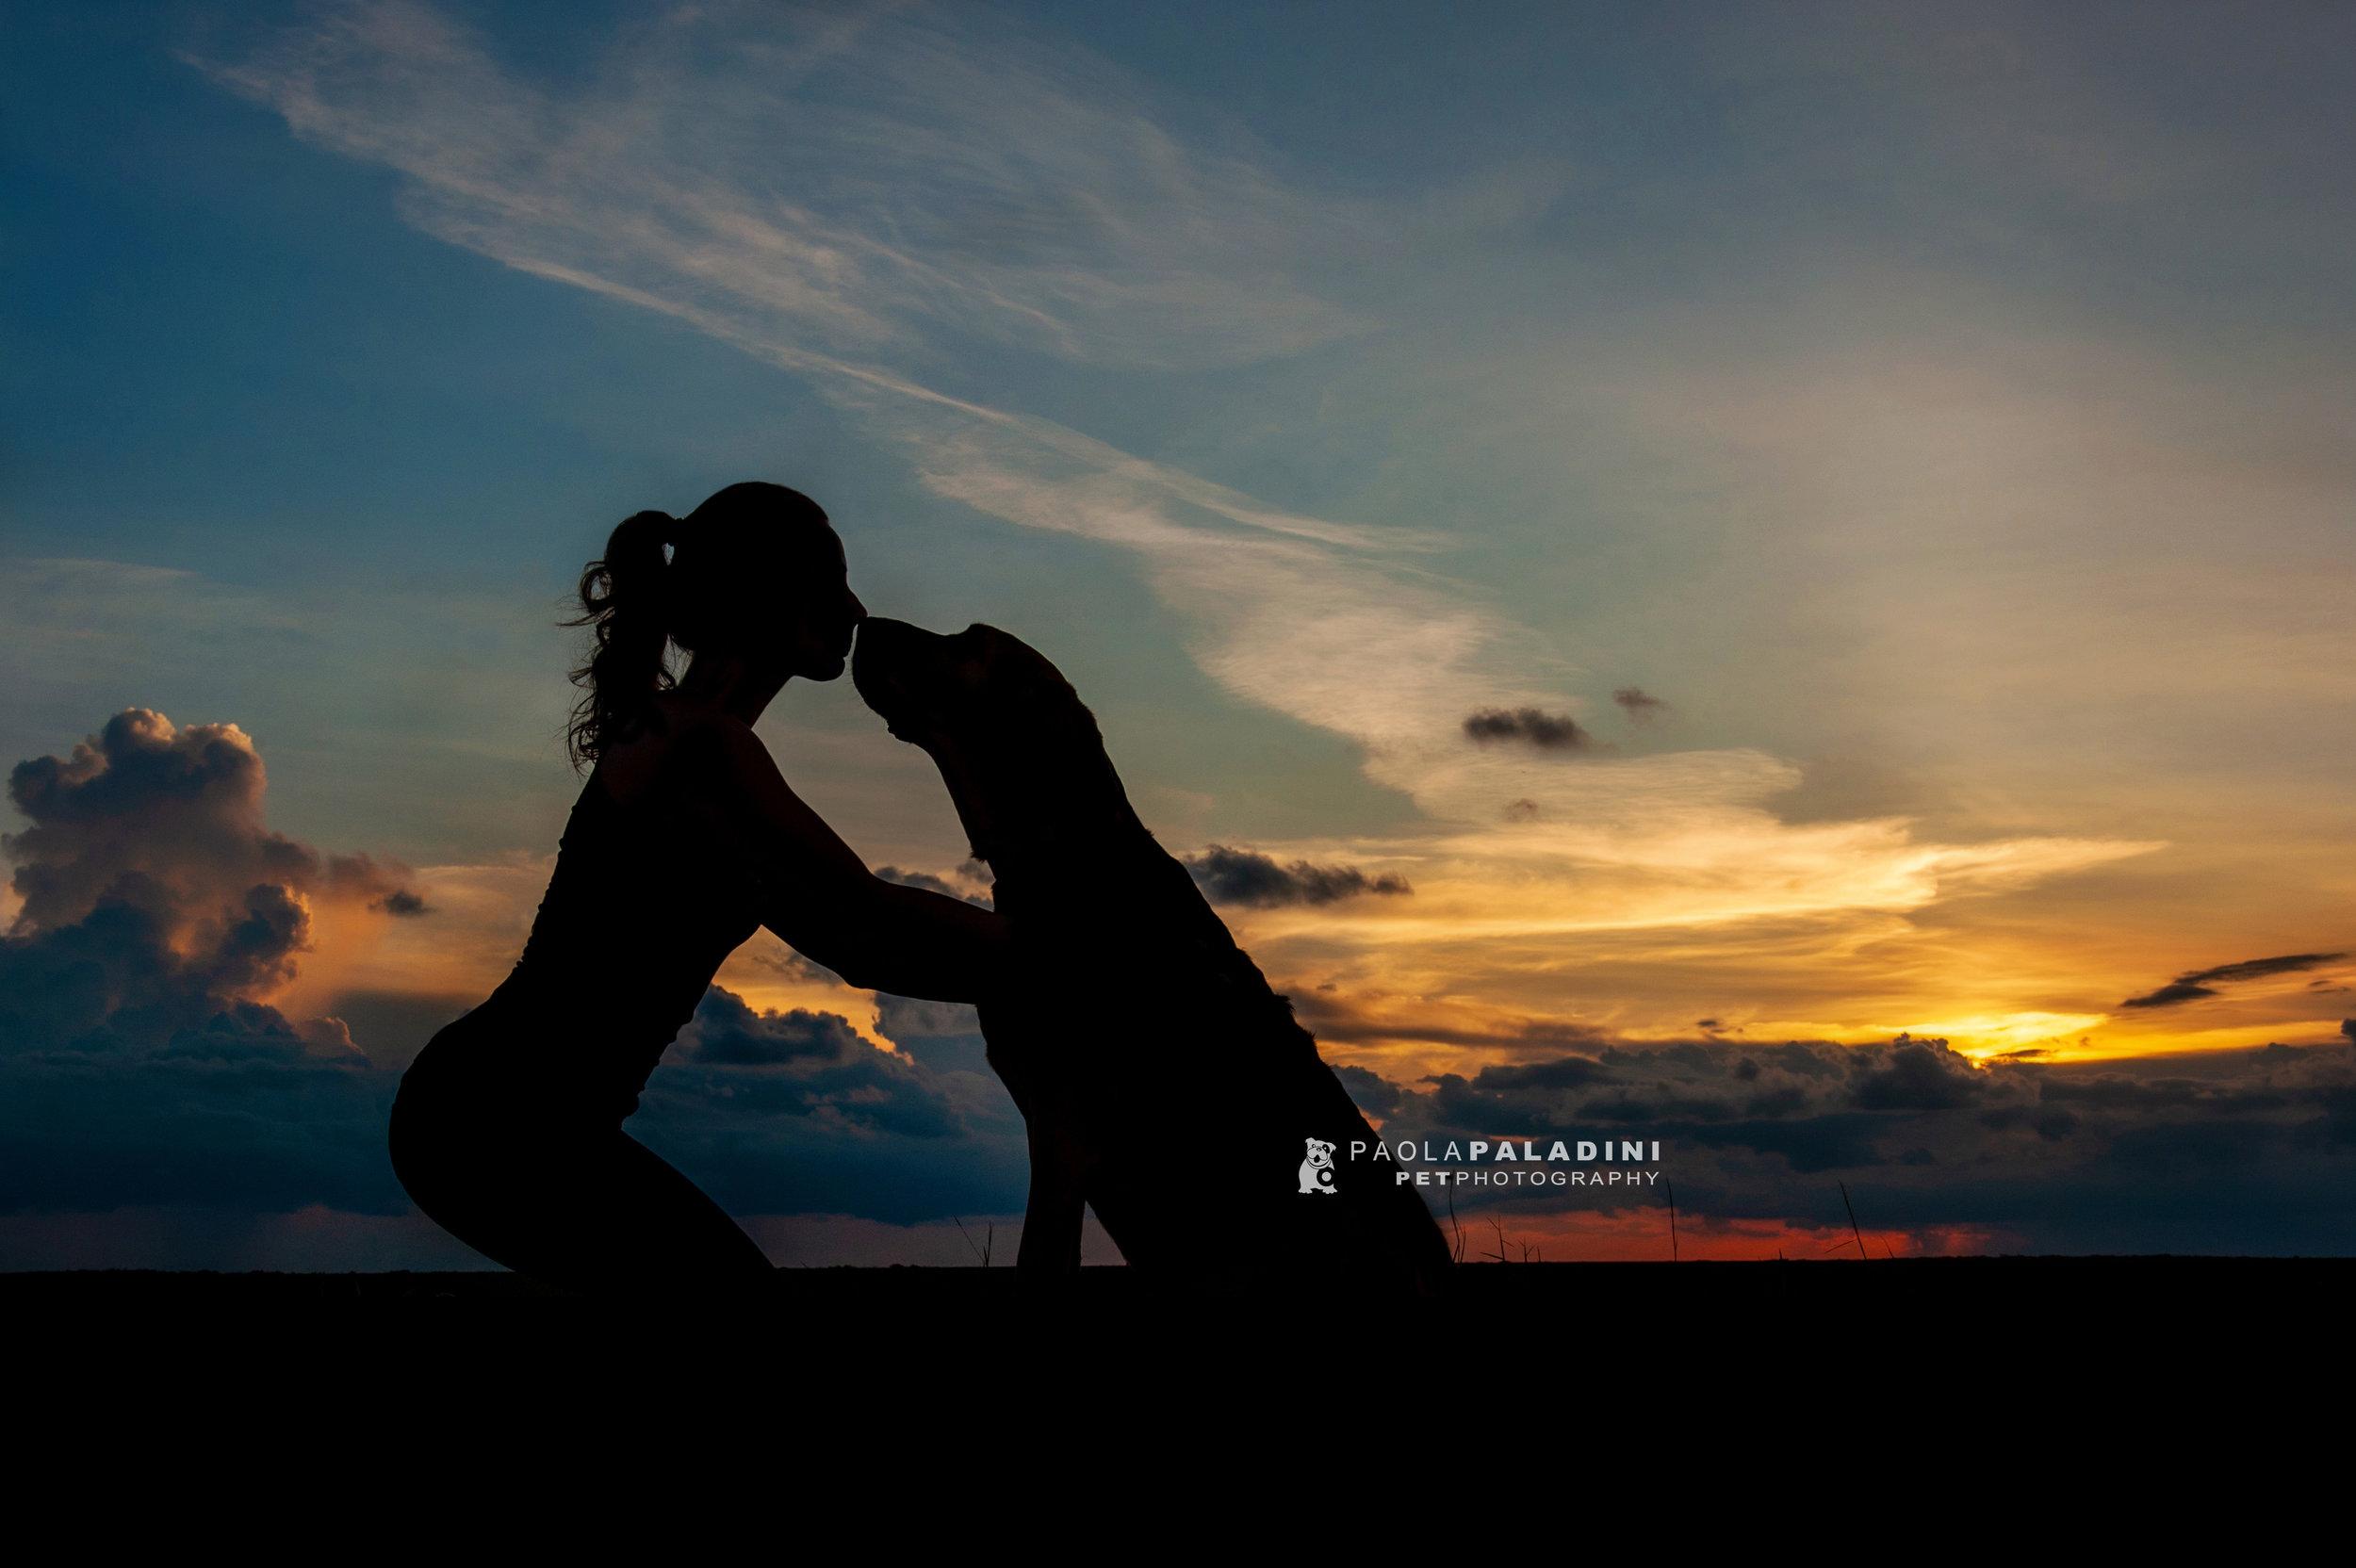 Paola-Paladini-Sunset-Silhouettes-Dog-Bloodhound-kiss